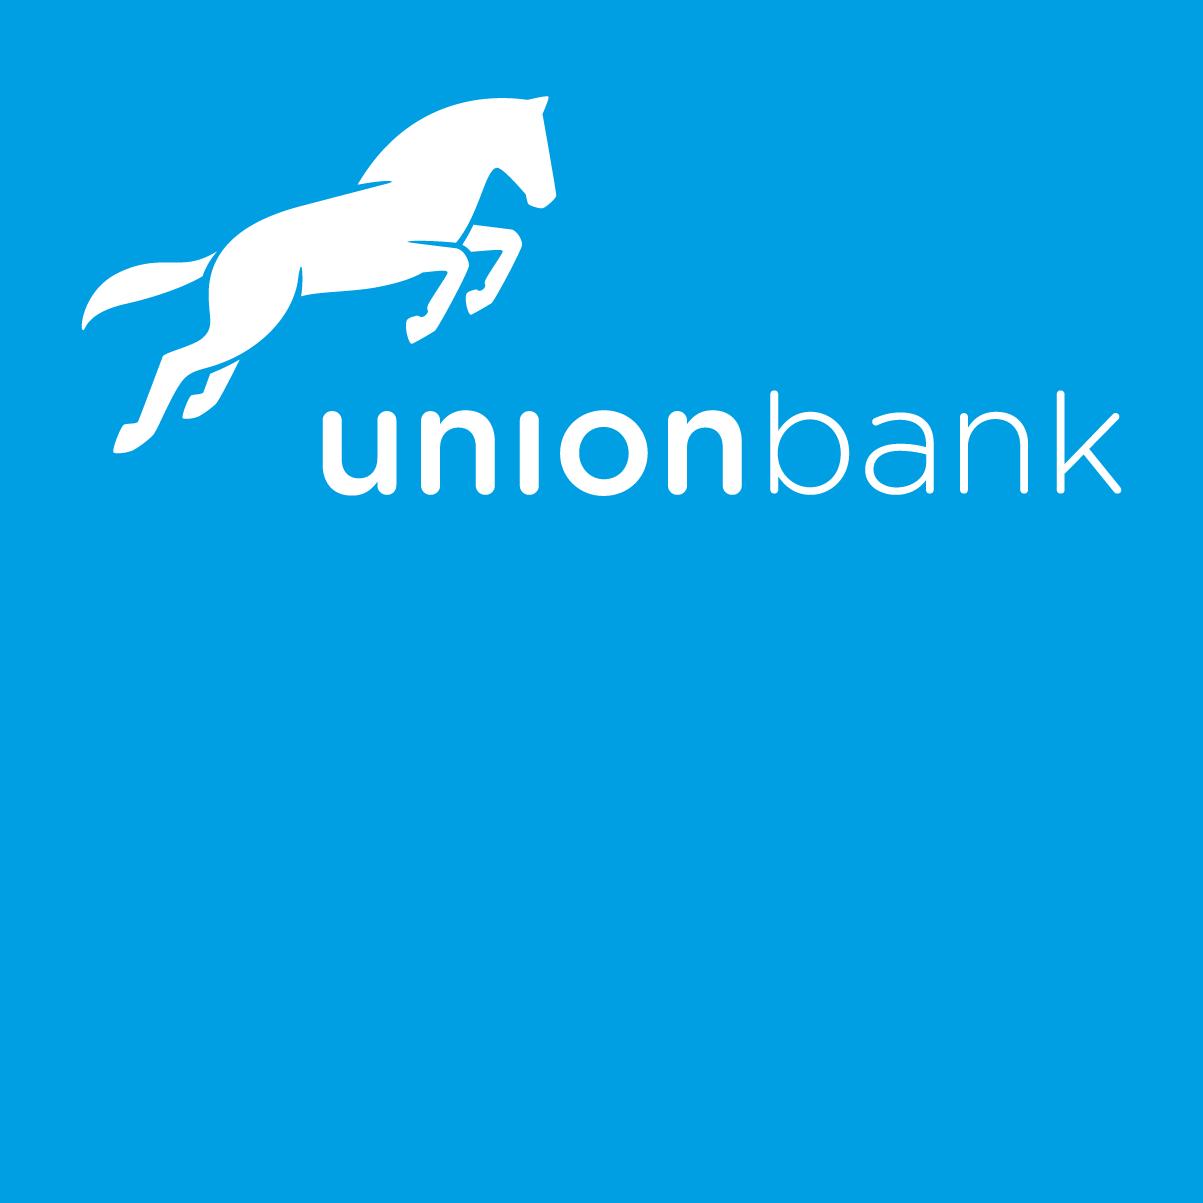 Union Bank of Nigeria New Logo